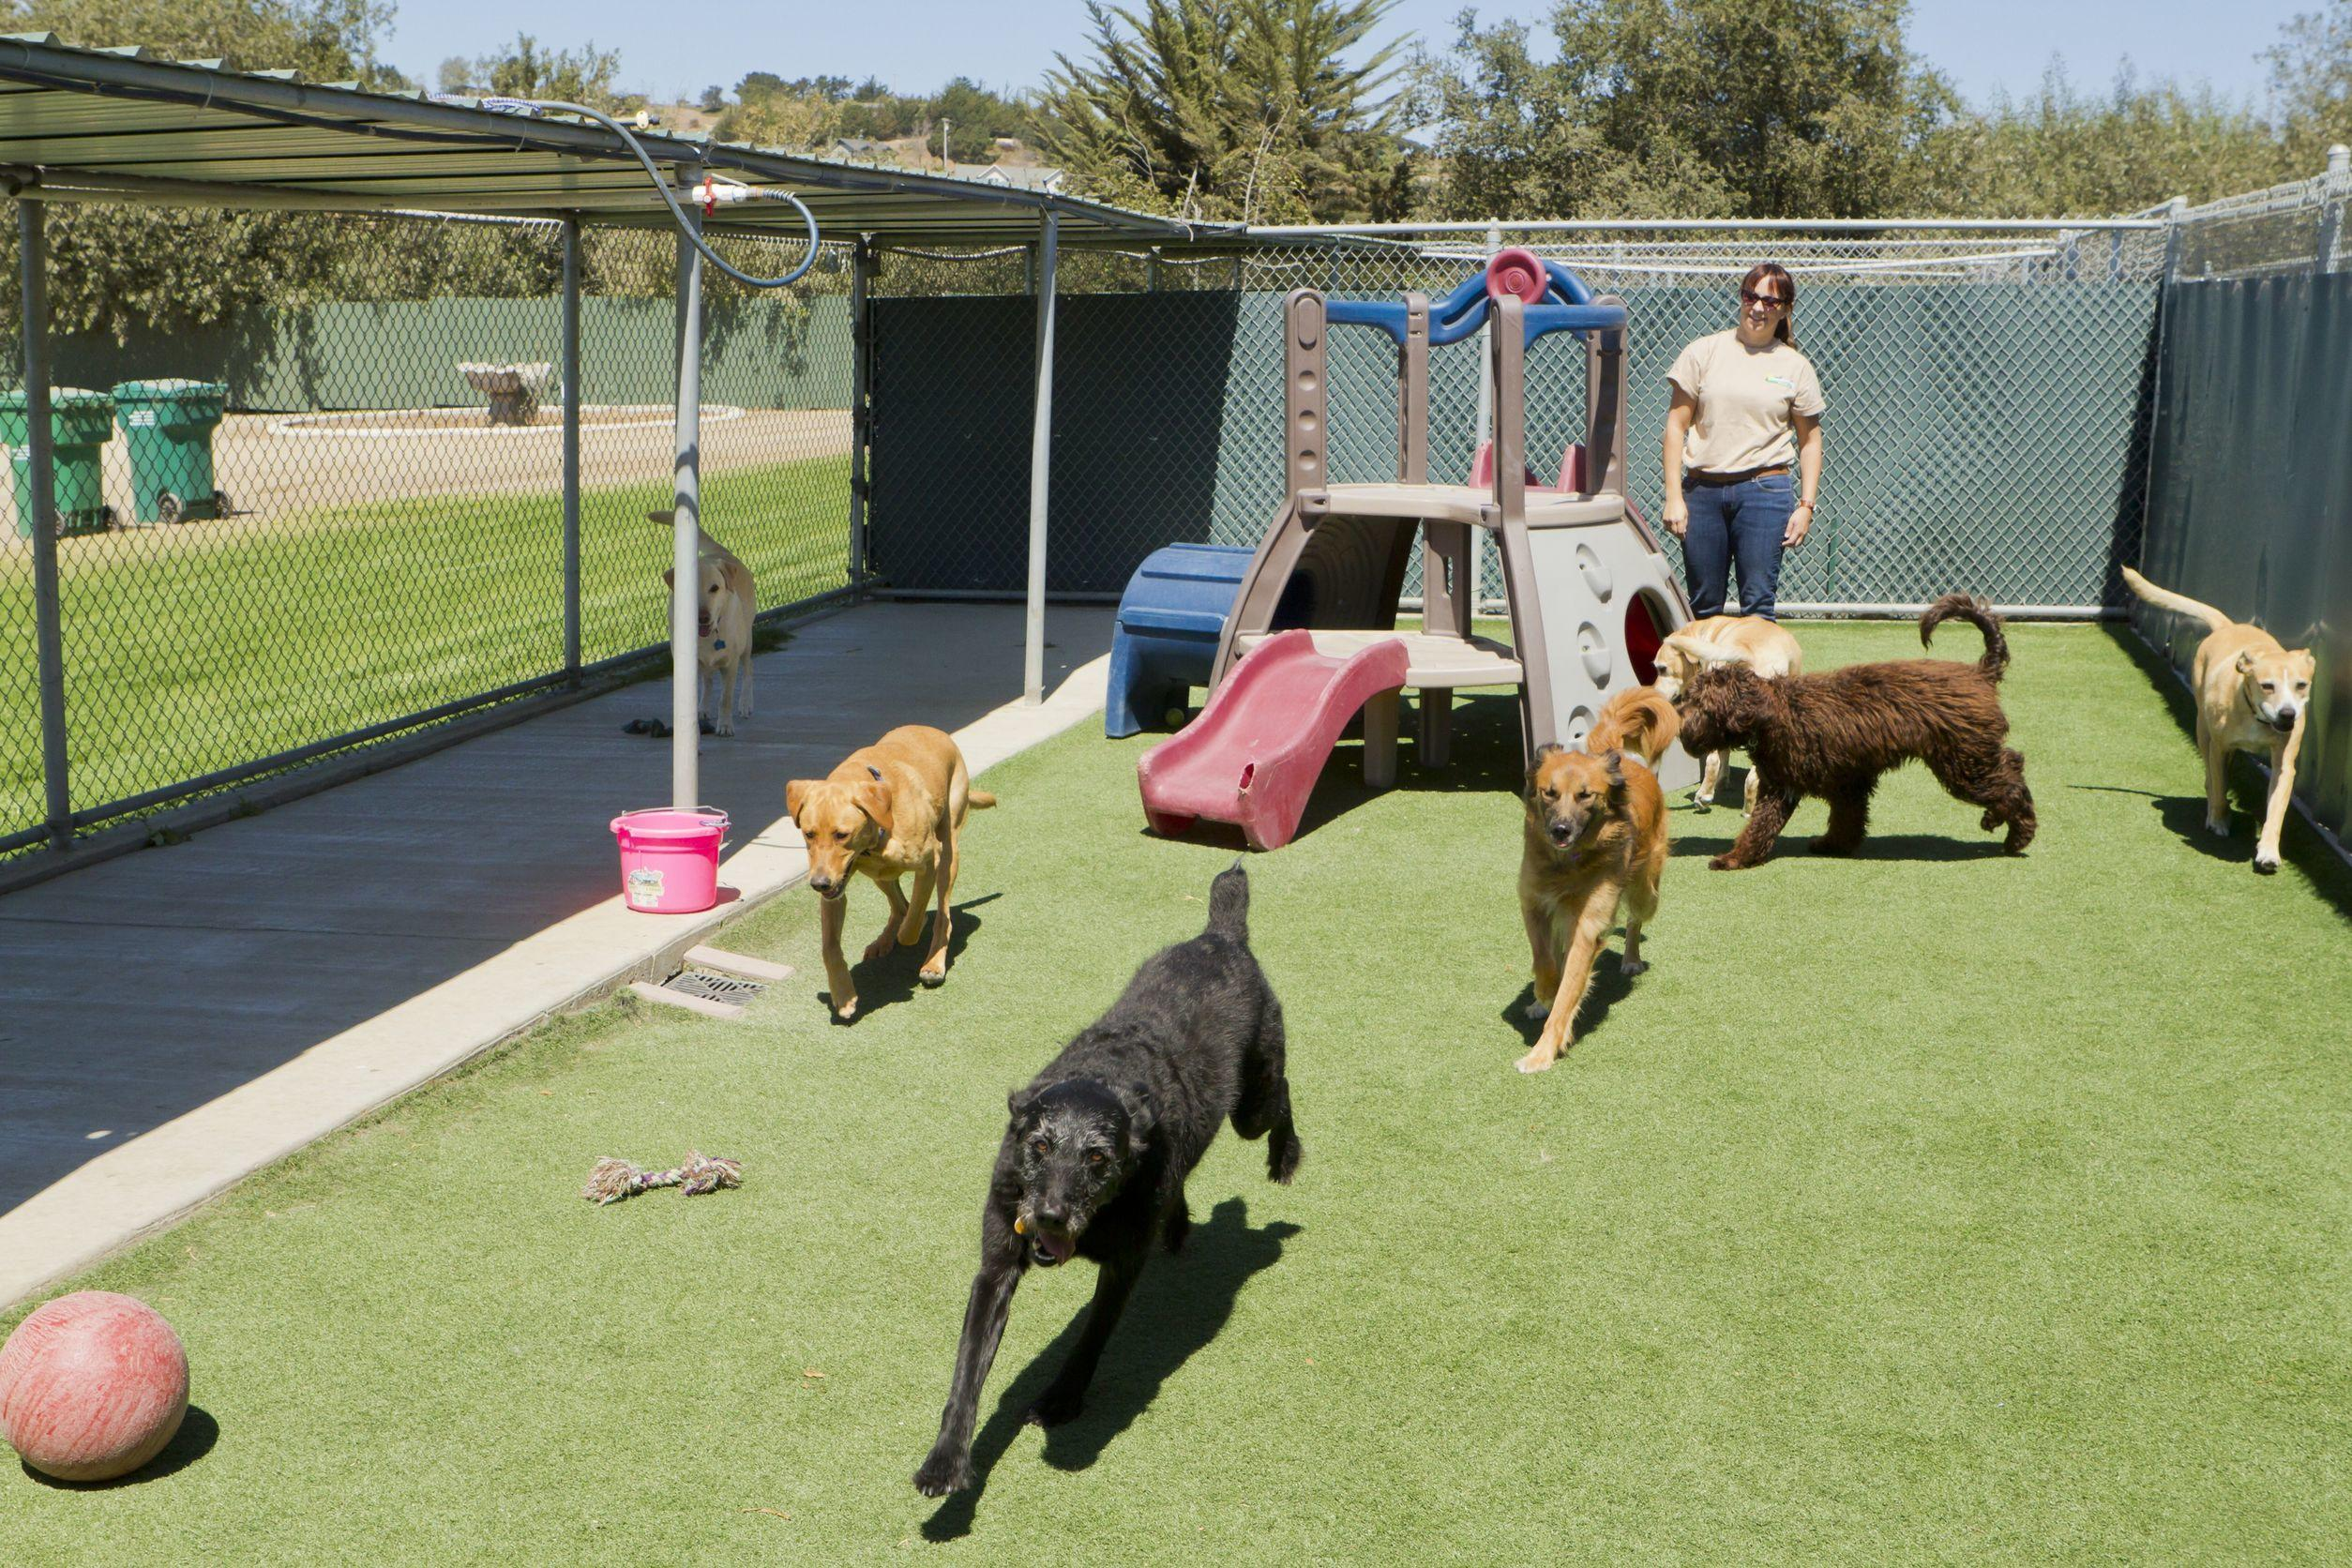 Pup Culture image 4